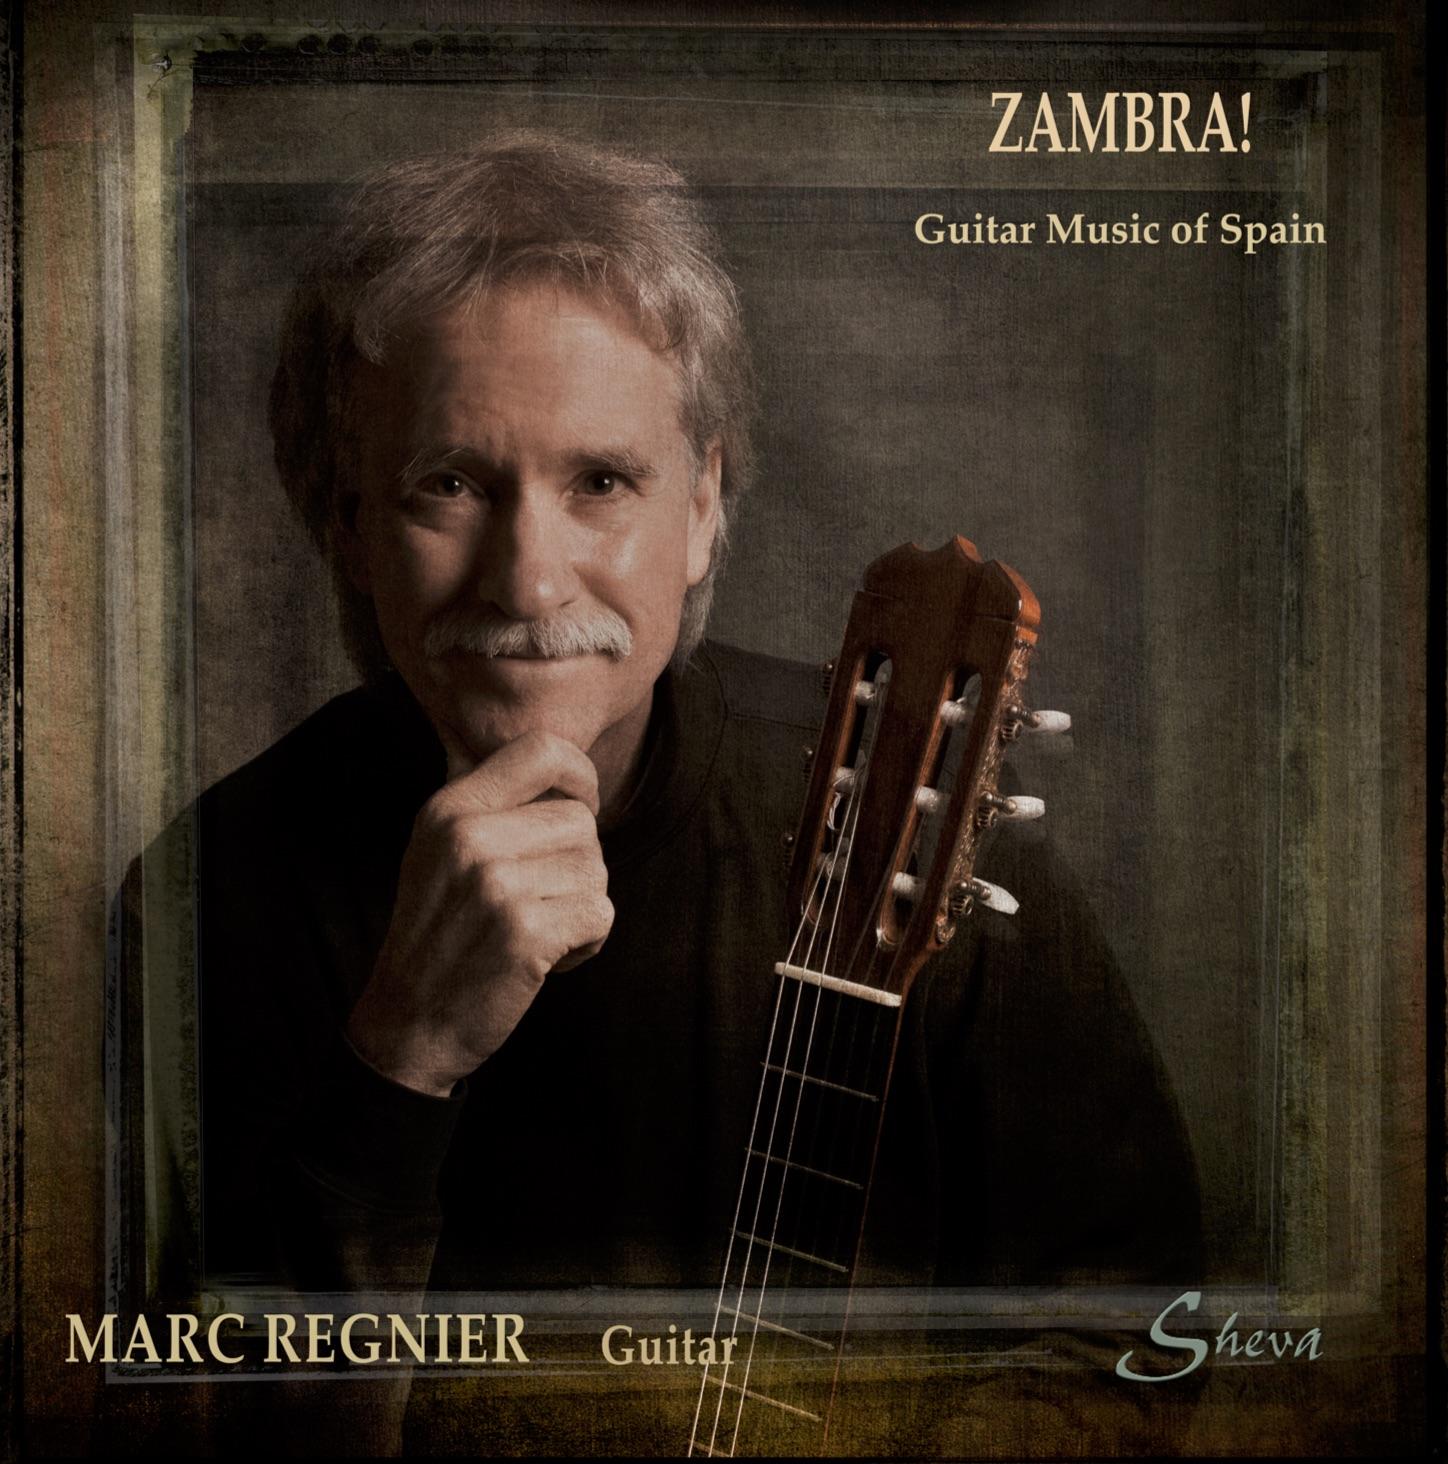 SHEVA 187 ZAMBRA! Guitar Music of Spain